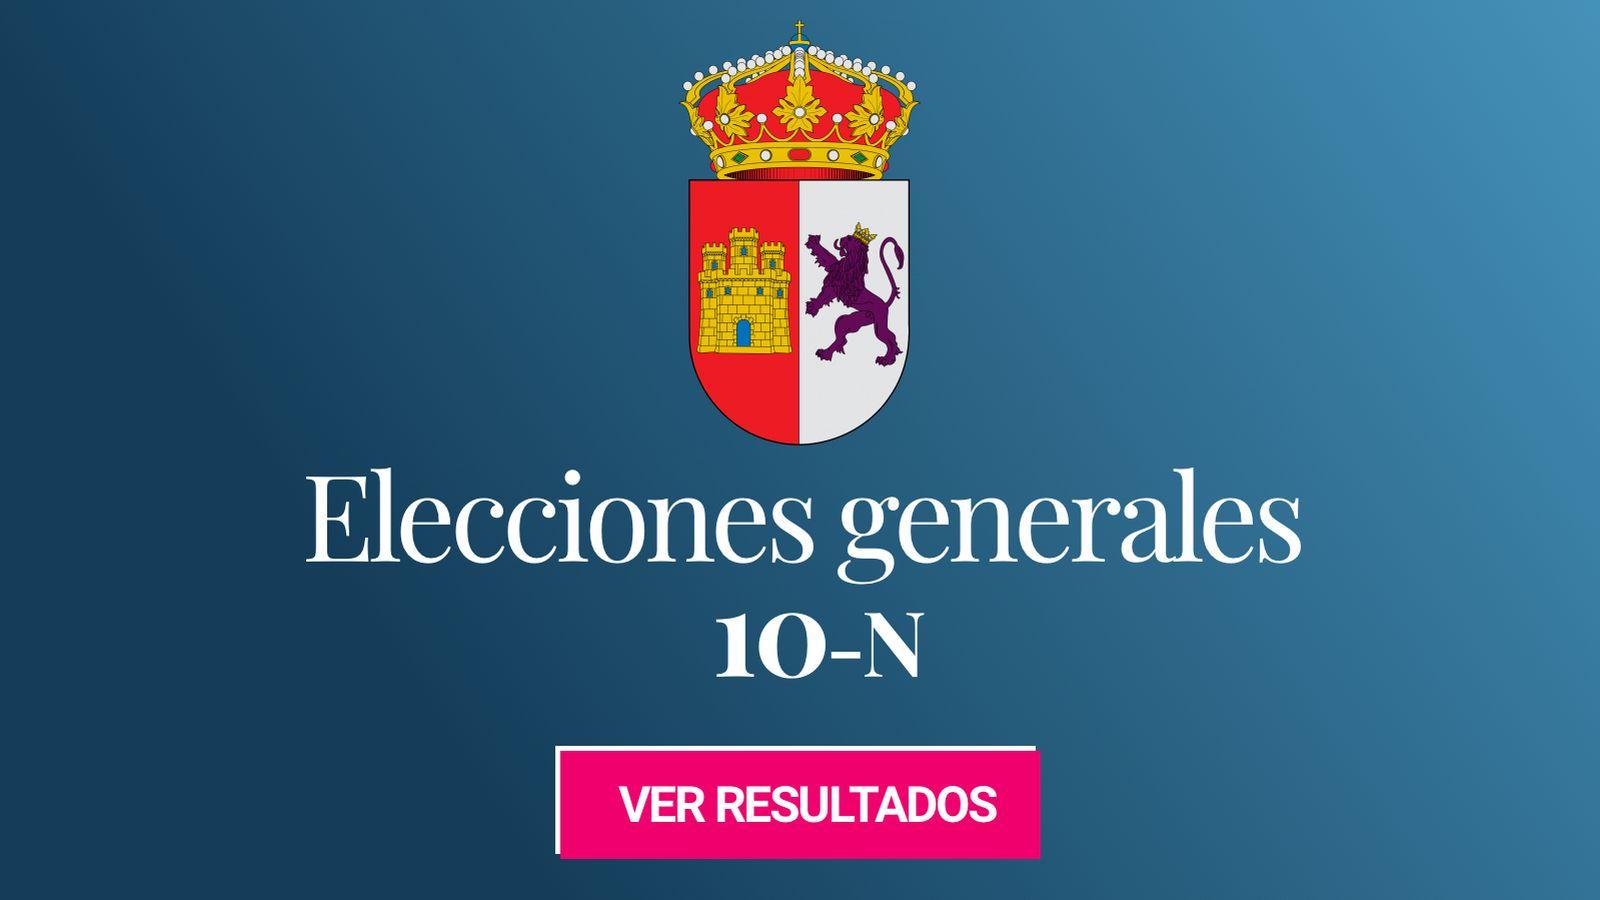 Foto: Elecciones generales 2019 en Cáceres. (C.C./EC)